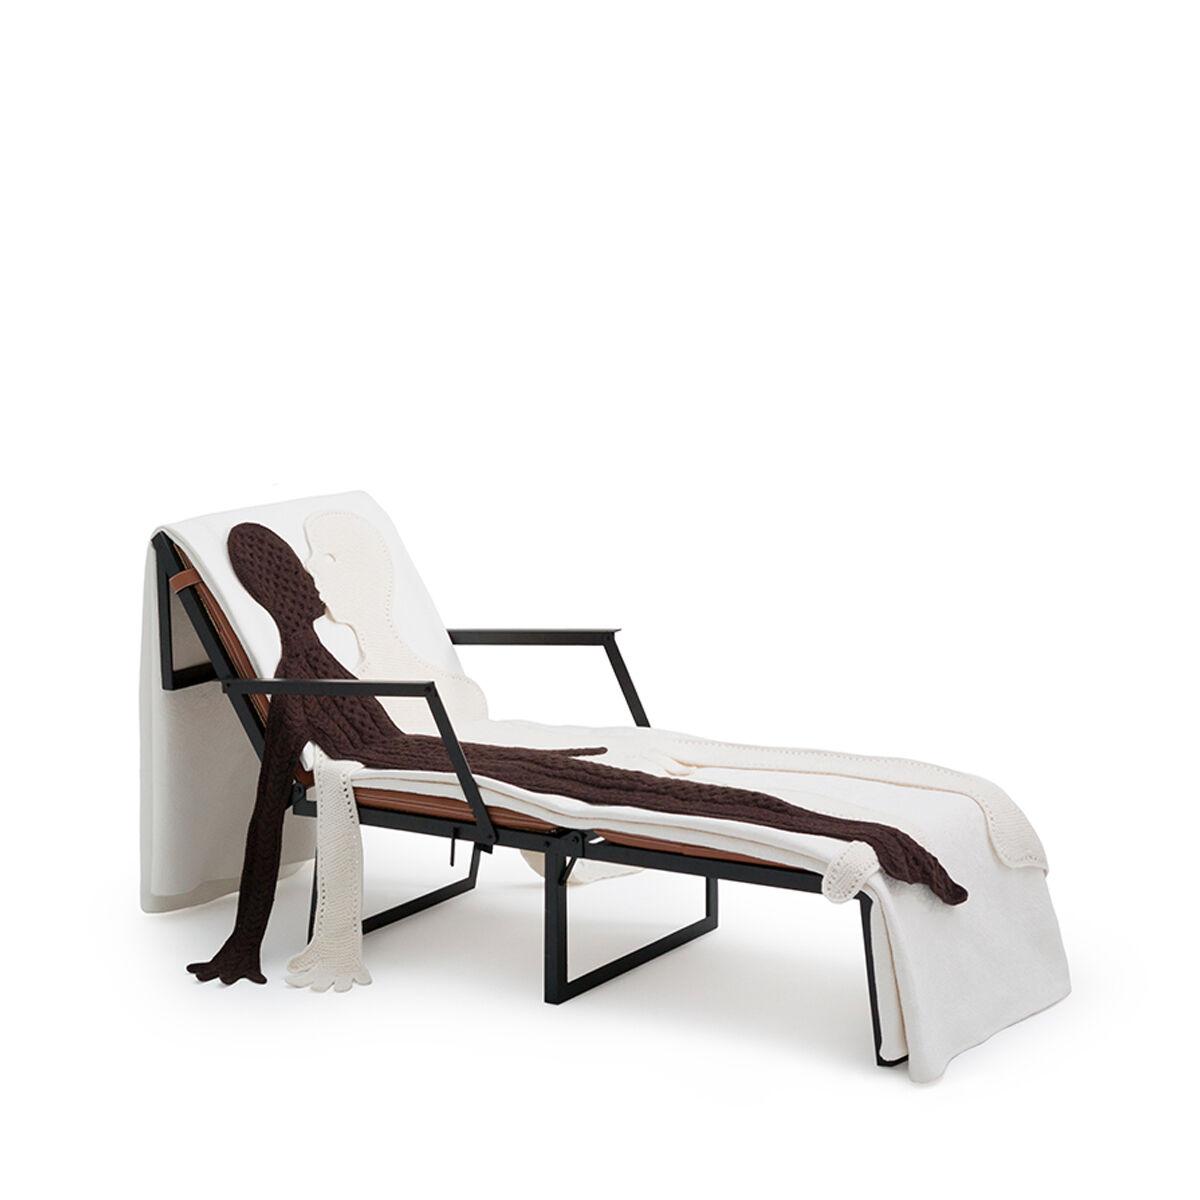 LOEWE Set Folding Chair And Figures 黑色/多色 all